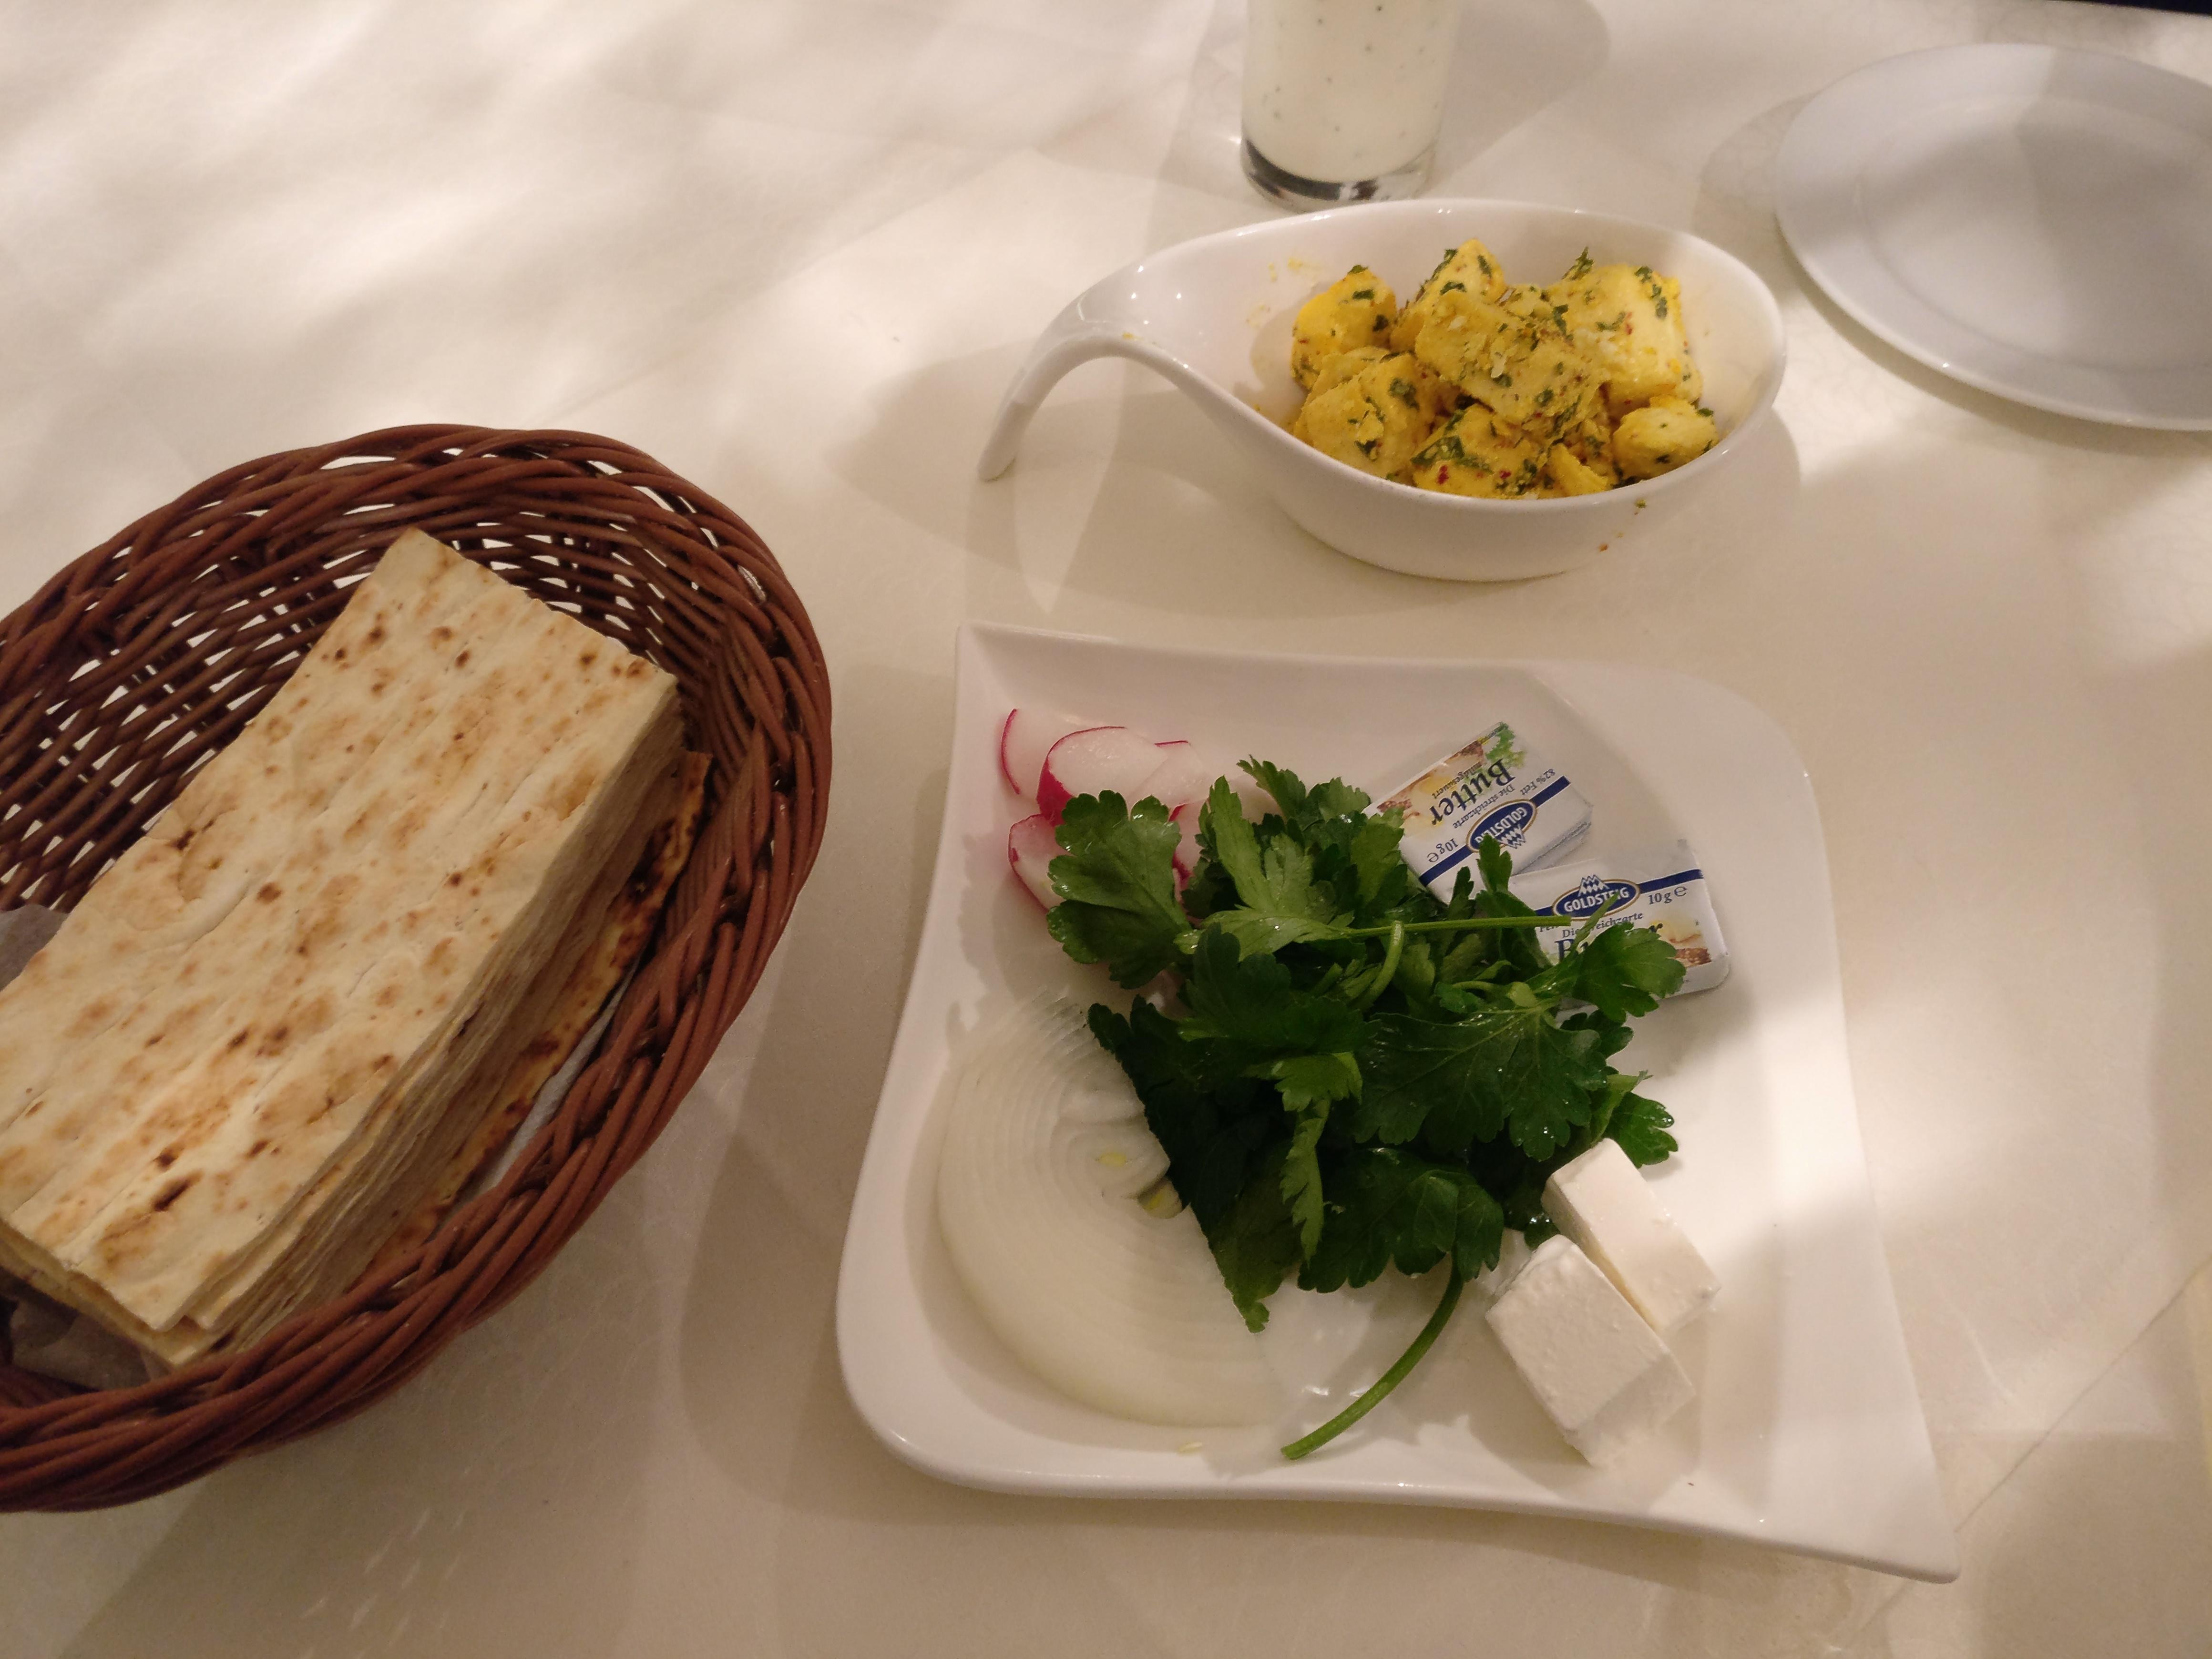 http://foodloader.net/nico_2017-03-14_brot-kaese-mit-knoblauch.jpg